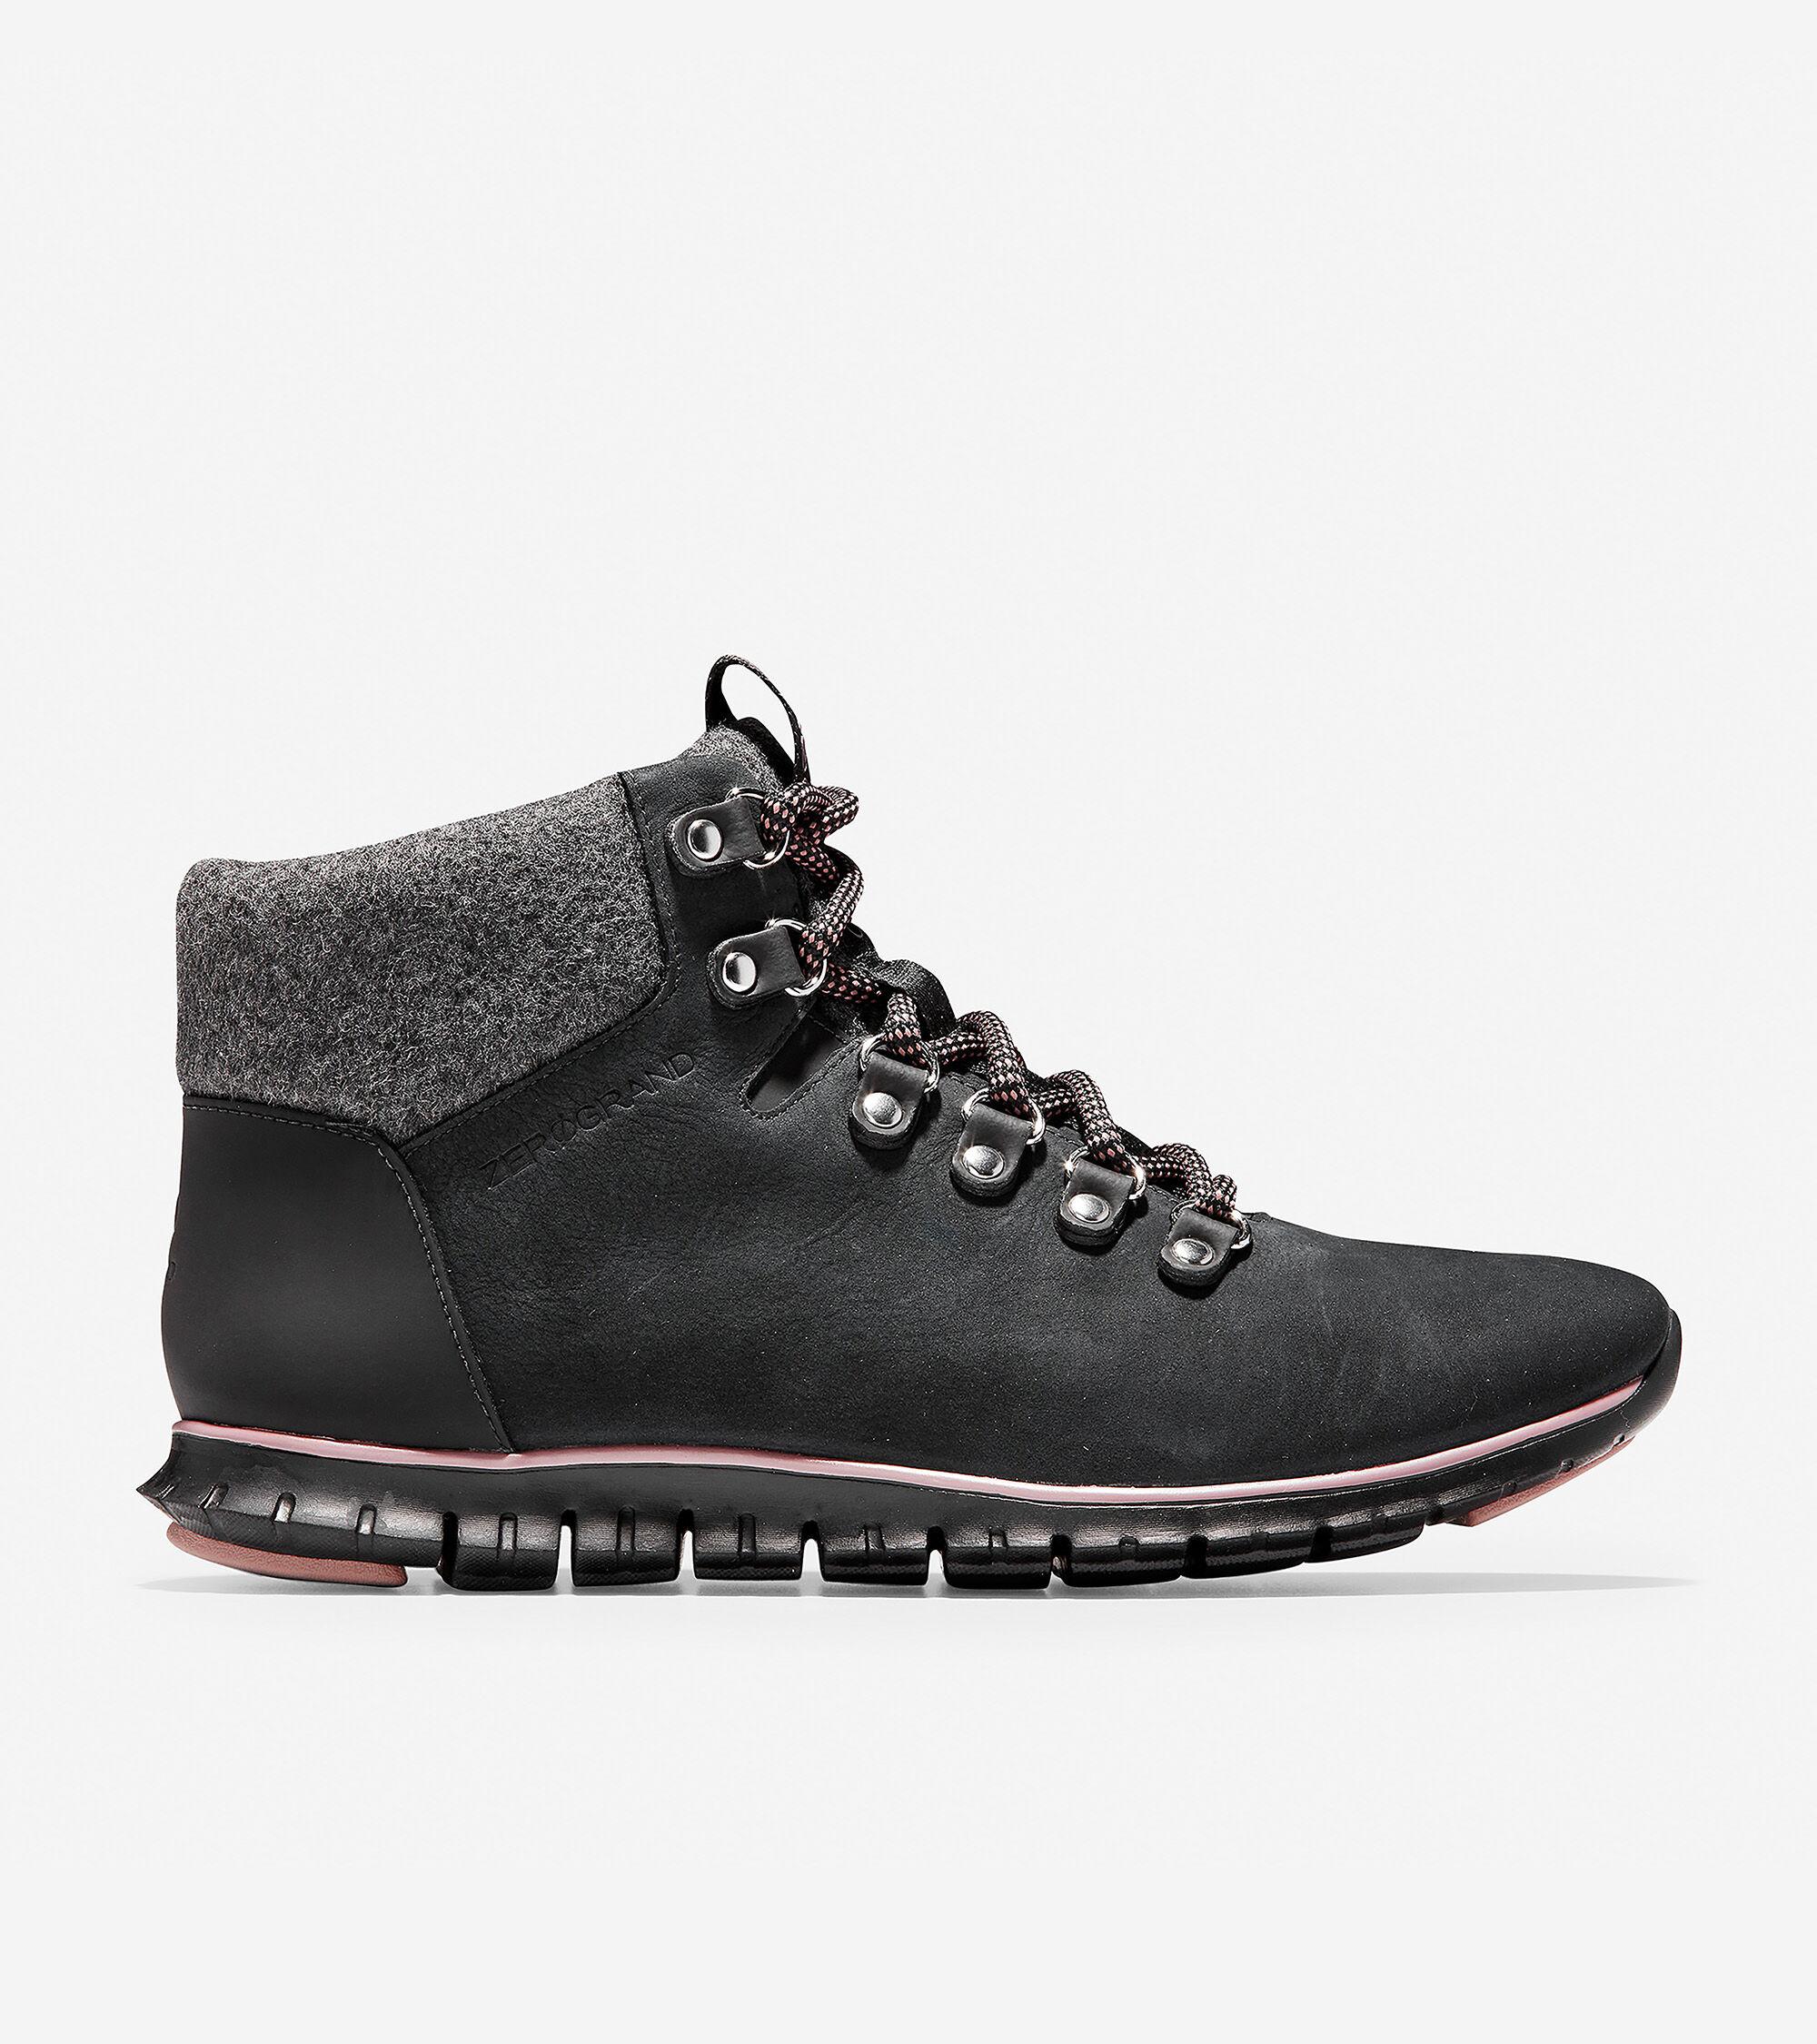 Women's ZERØGRAND Hiker Boot in Black